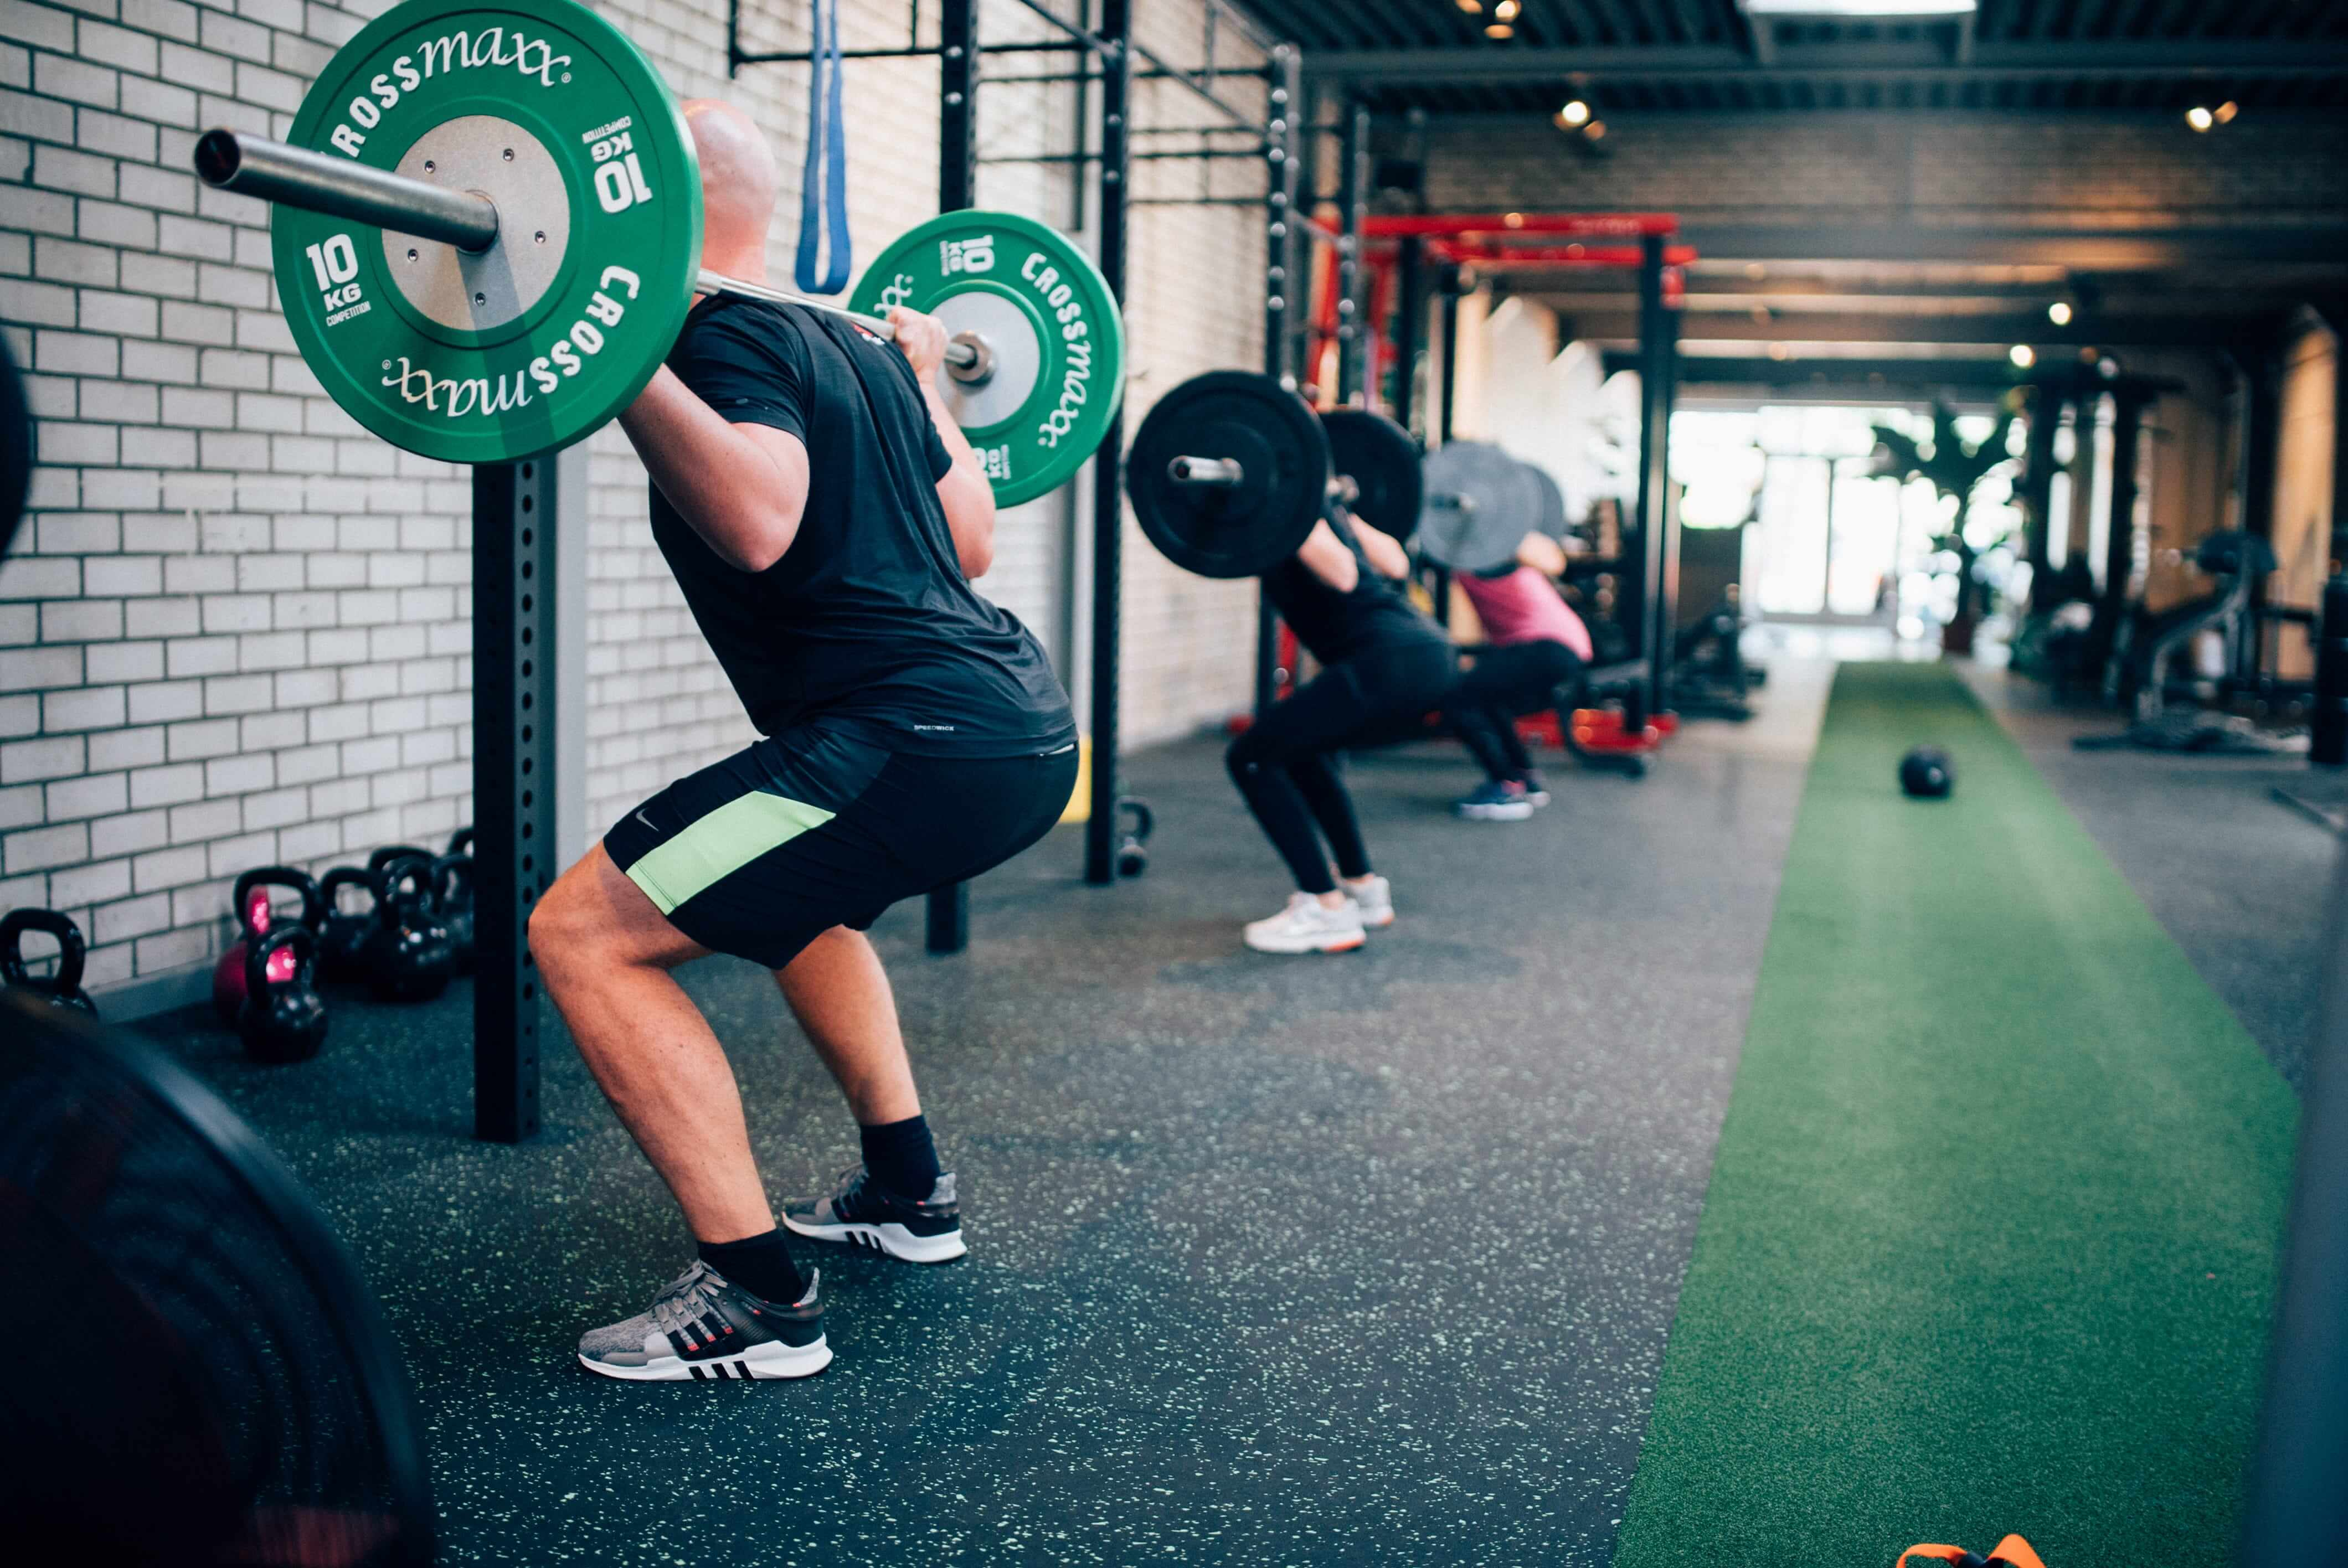 BMI Heemstede Workout